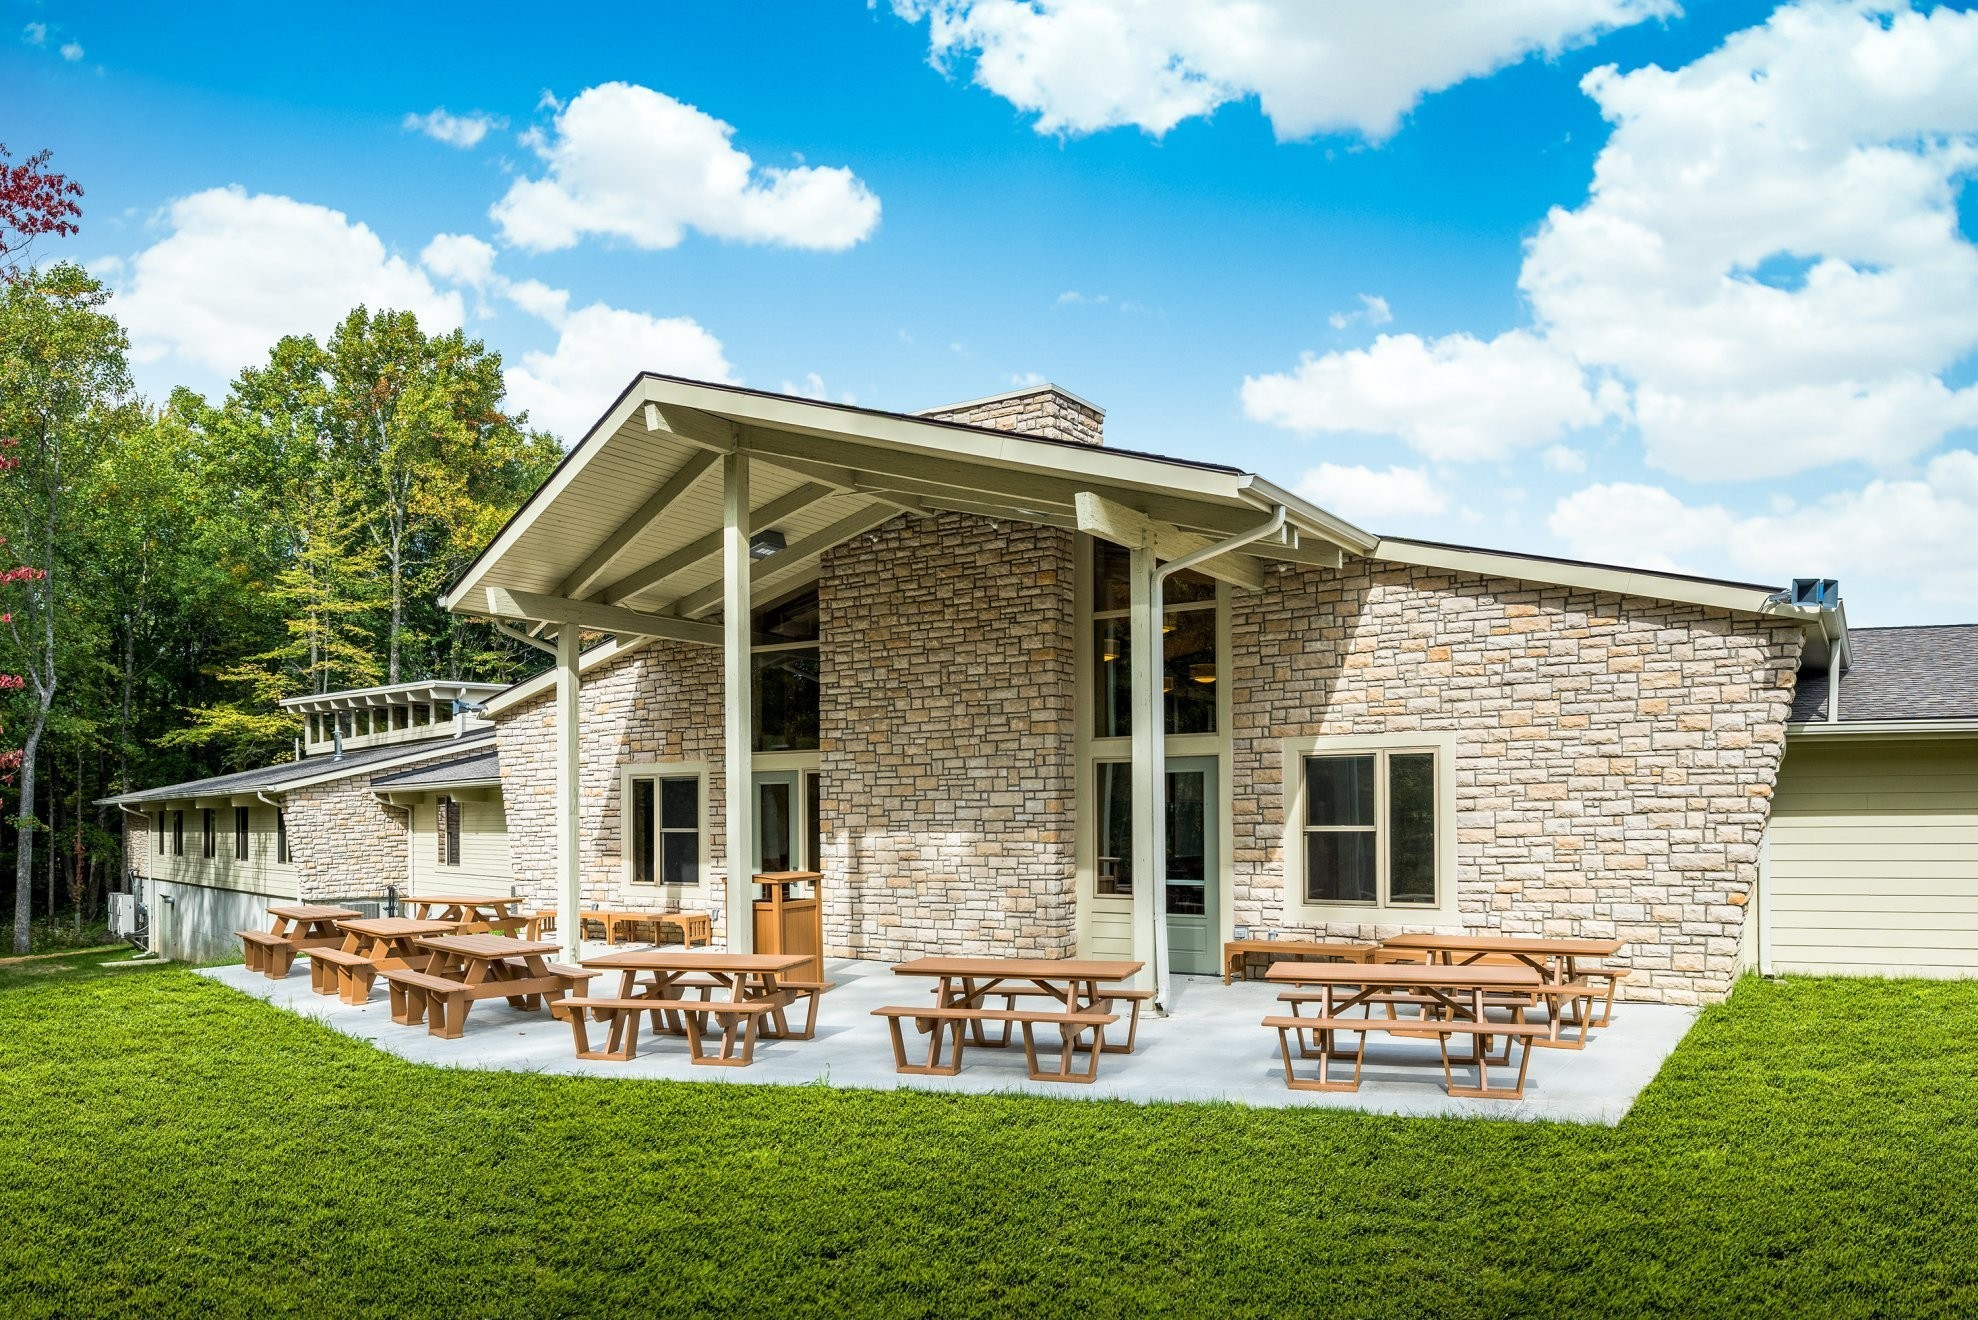 Camp Swoneky Family Housing Lodge Amp Pool Case Studies